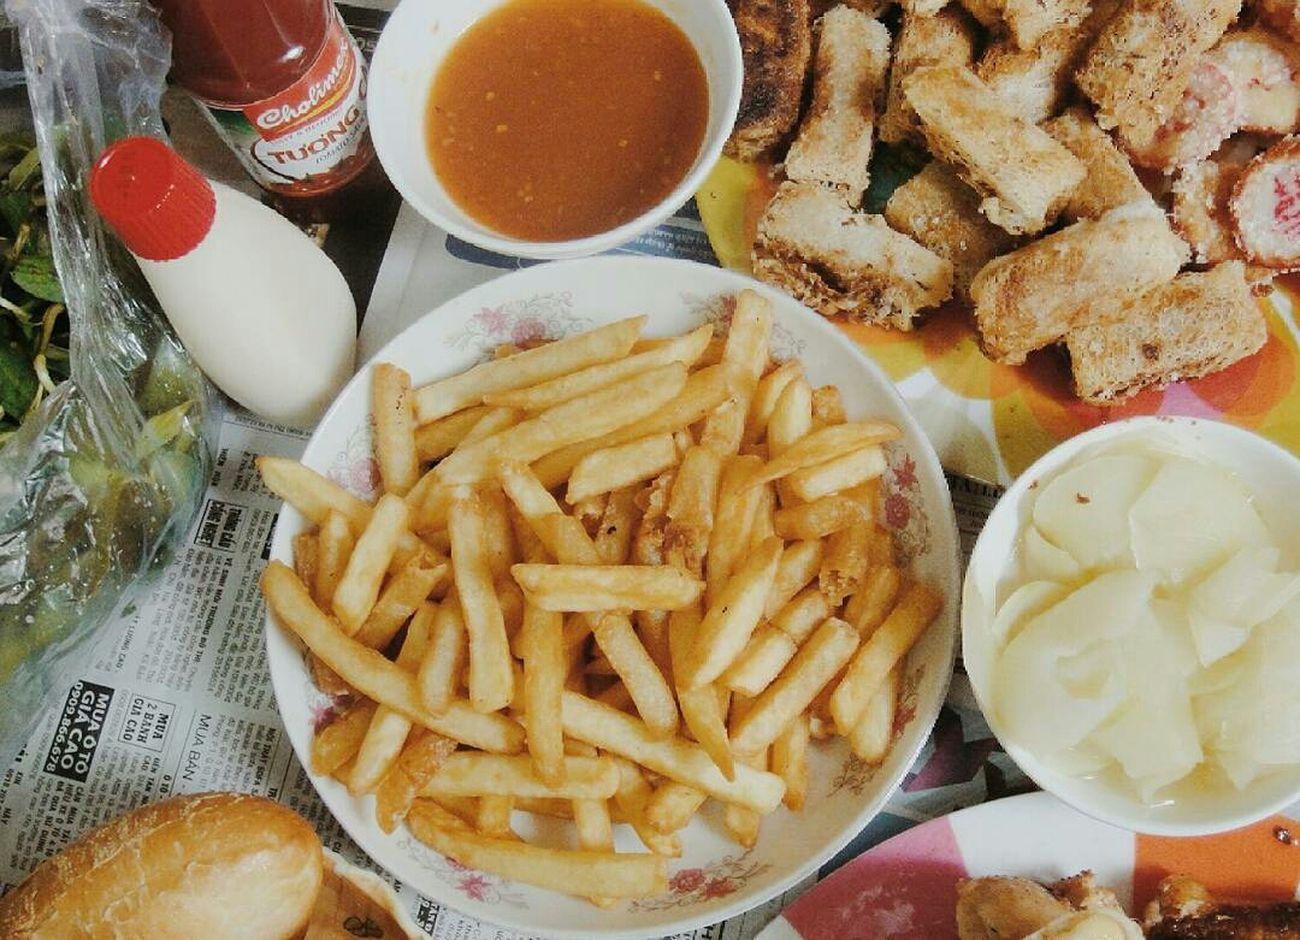 Vietnamese Food Delicious Foodshare Foodporn Foods Foodstagram Foodlovers Foodlife Foodlicious Ilovefood Foodlover Foodpic Foodphotography Foodgasm Foodgram Food Foodshot Enjoying Life Foodpics Relaxing Foodlove